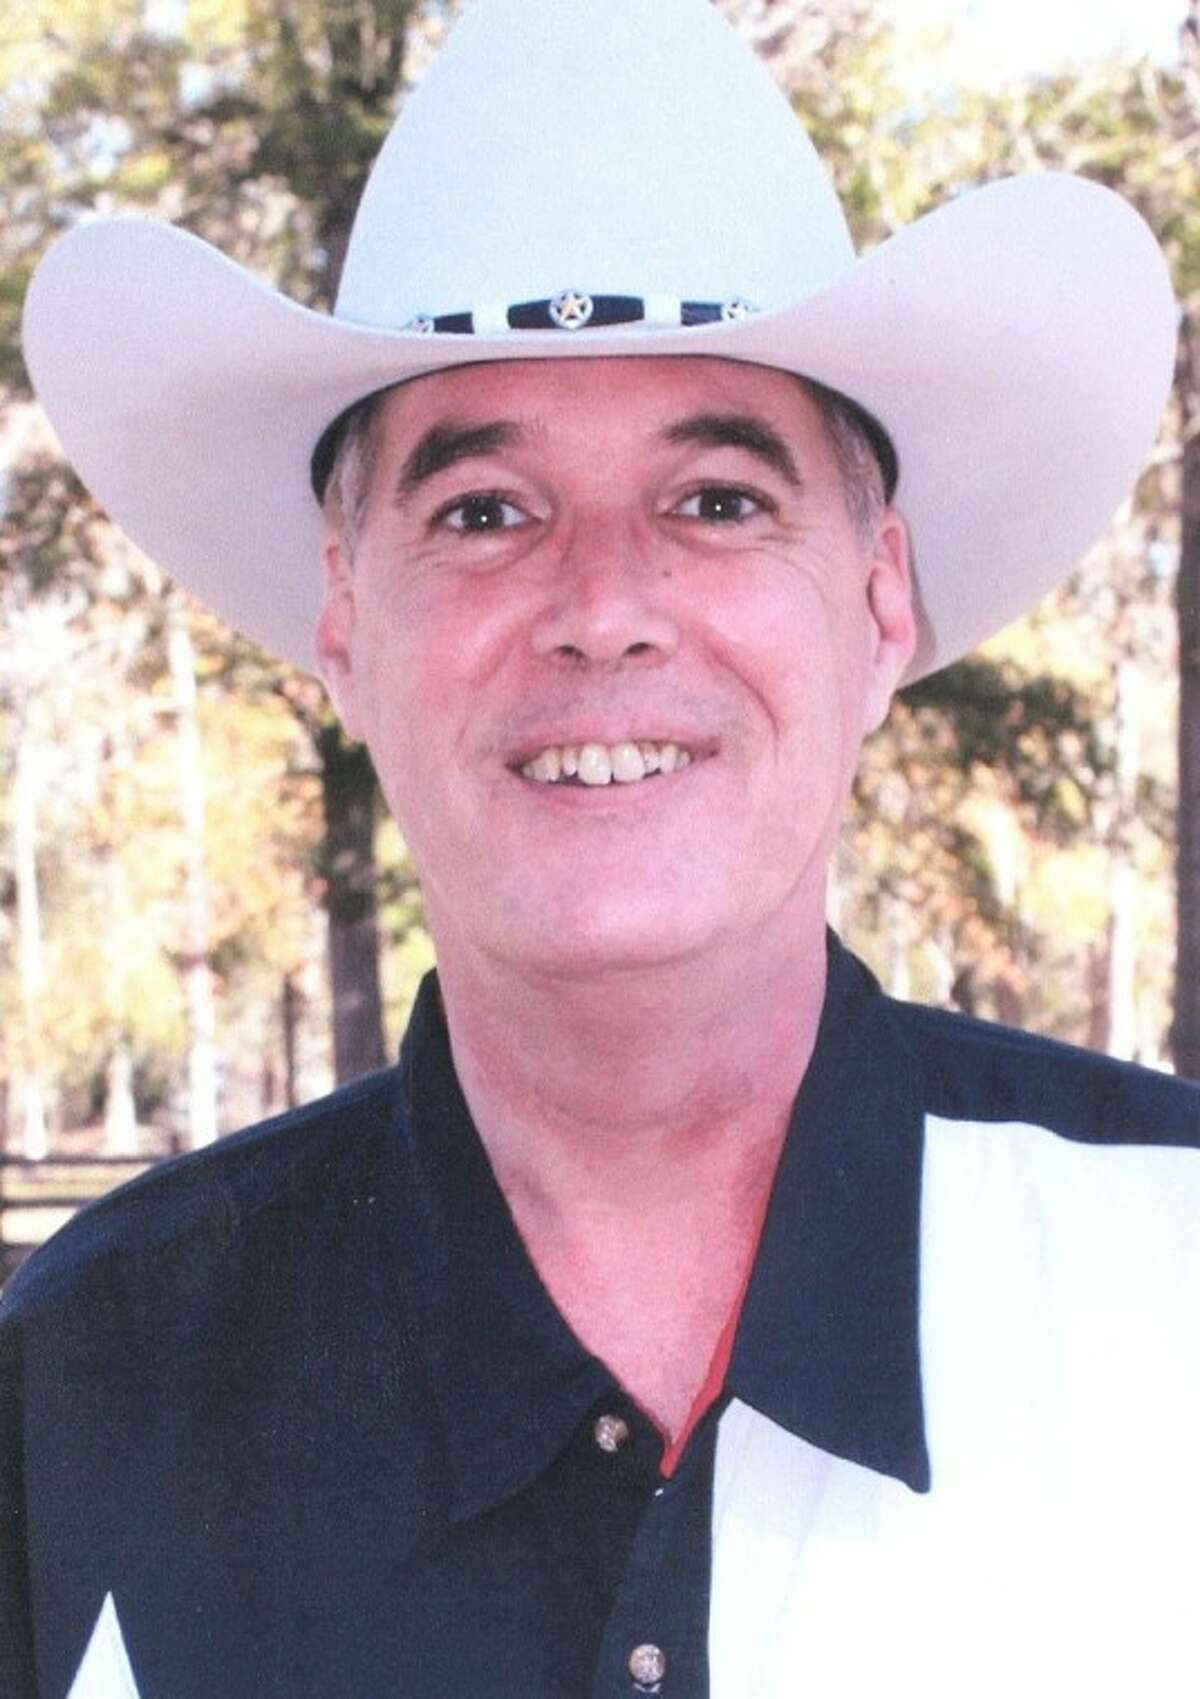 Theron Runnels has announced his candidacy for San Jacinto County Precinct 3 Constable.